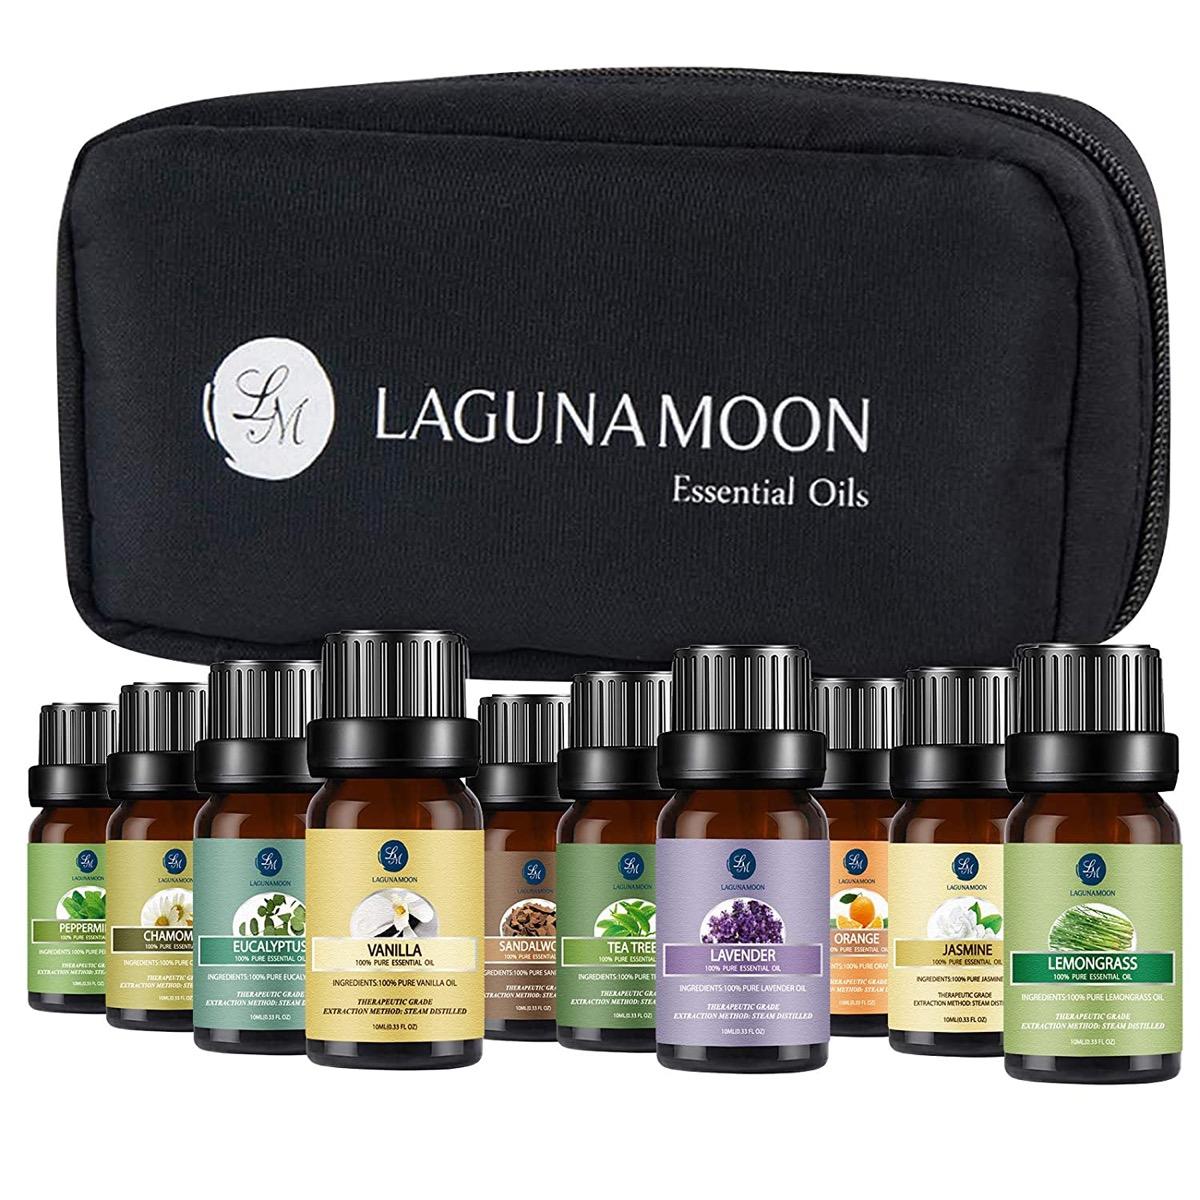 bottles of essential oils and black case